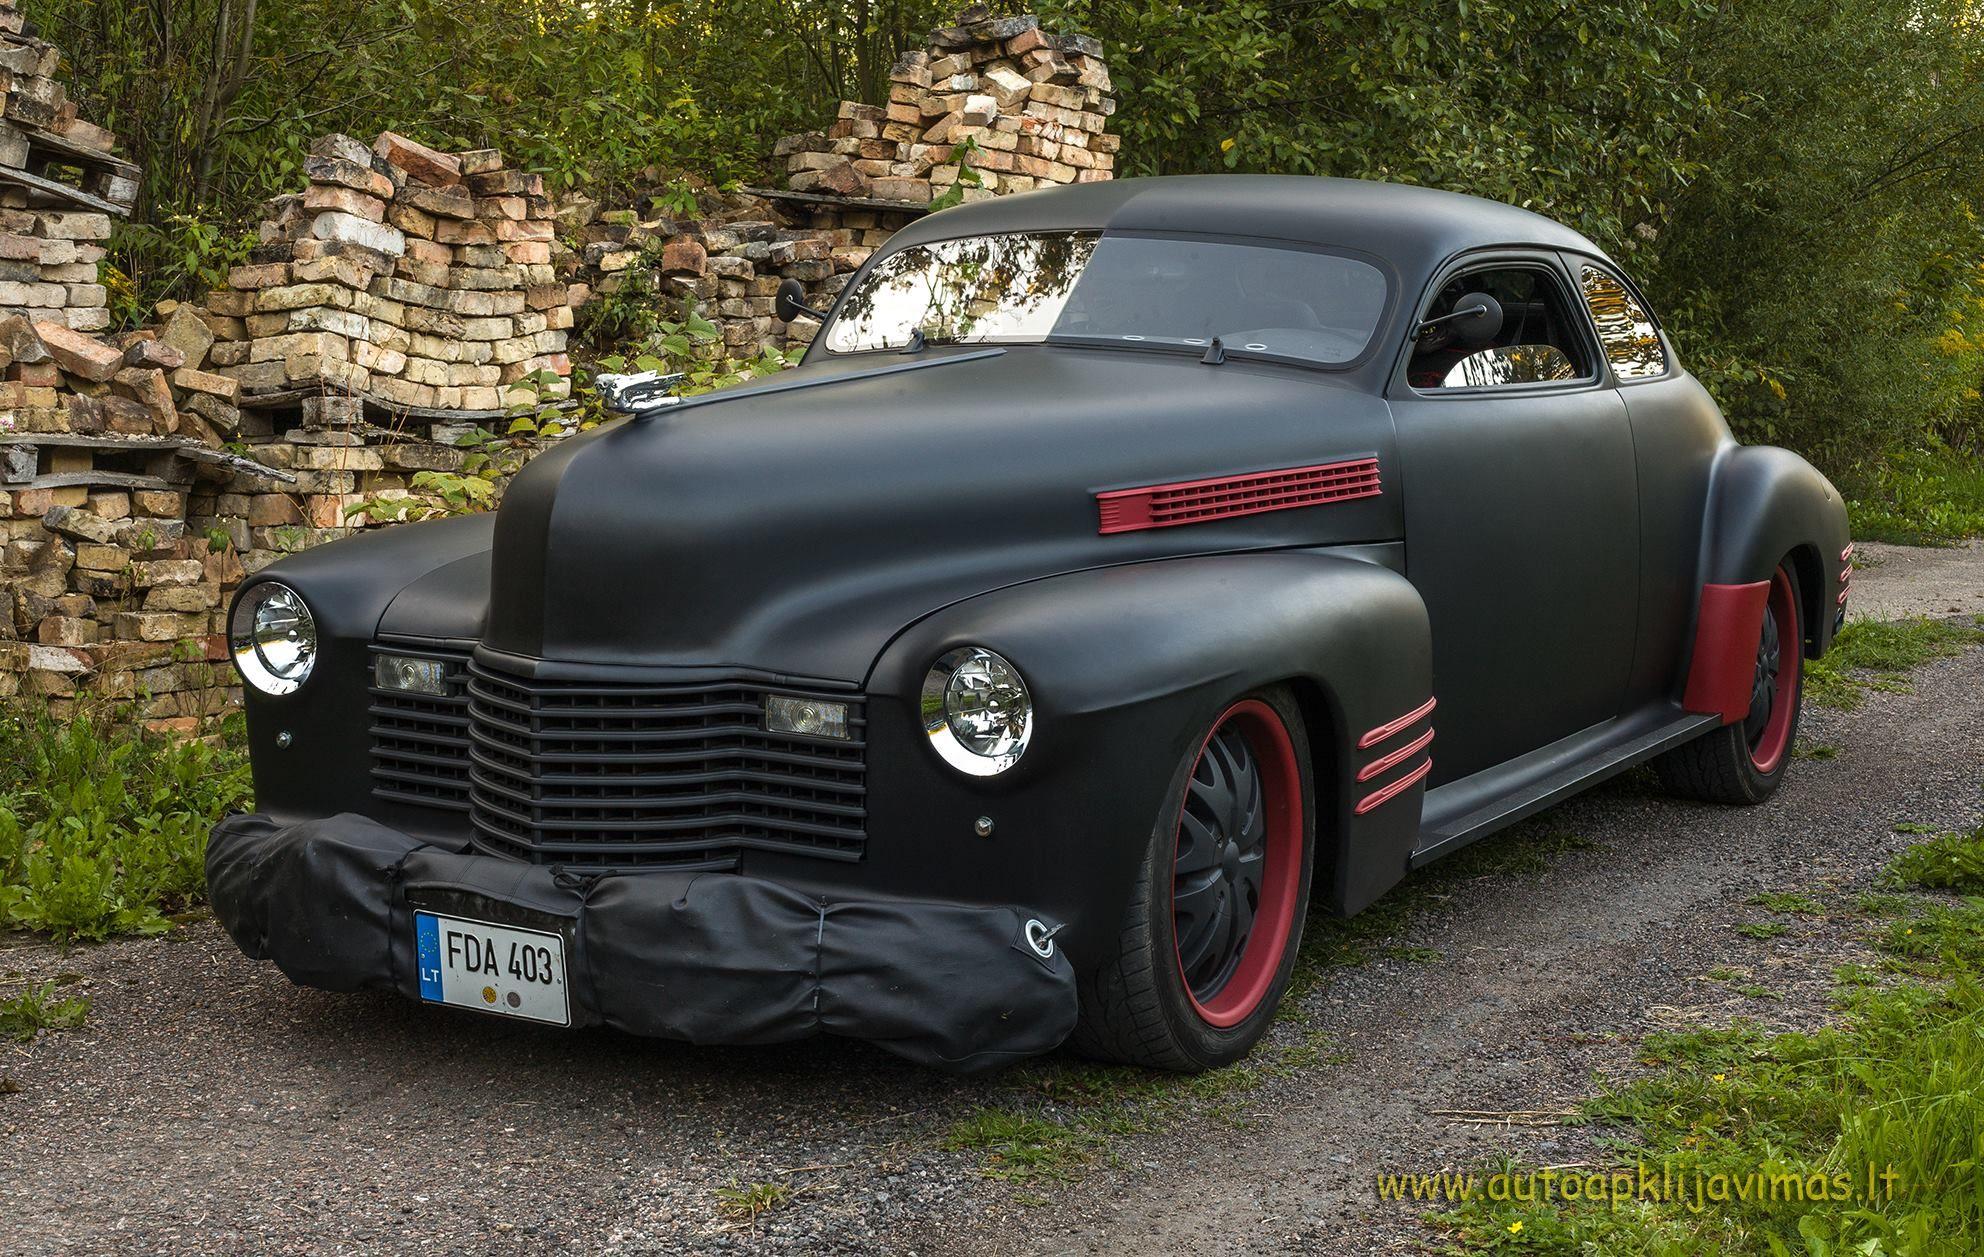 My kind of car ;) Prefer this better than some Ferrari or Lamborghini ...